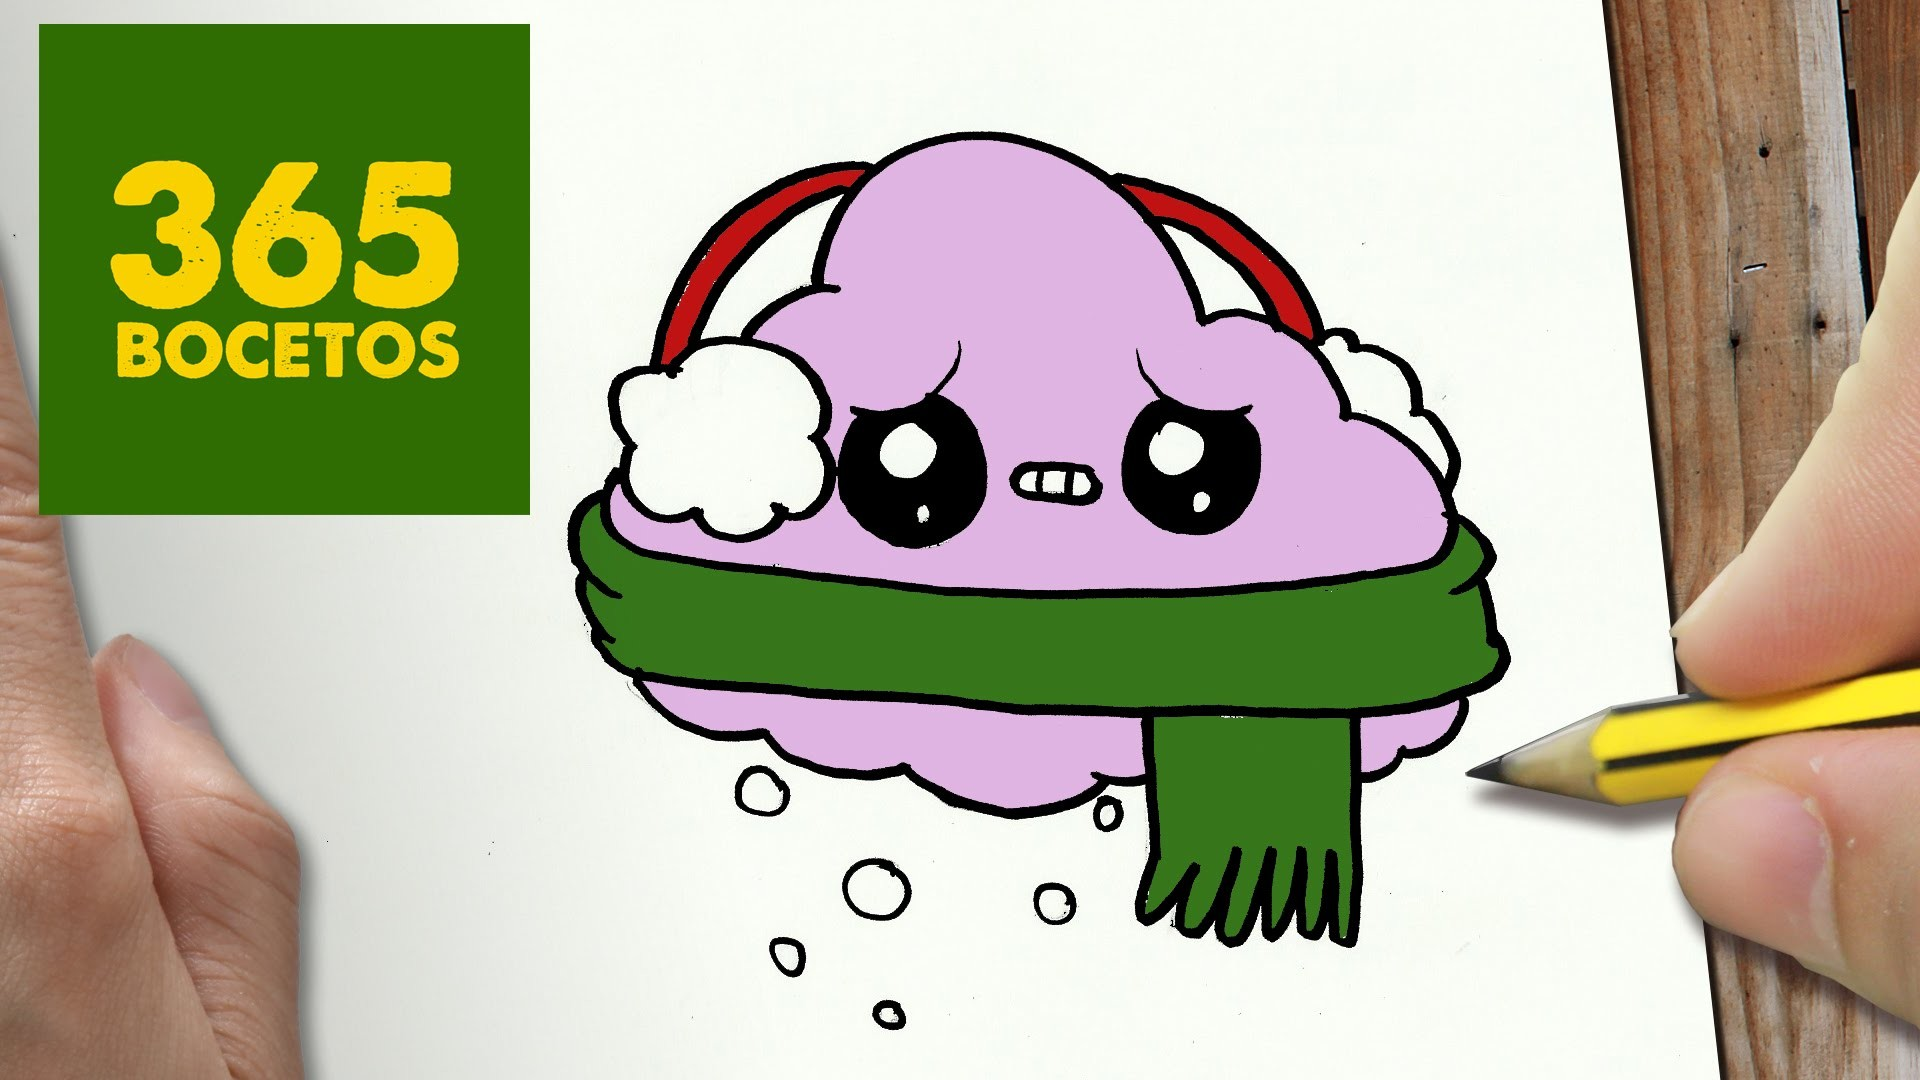 Como Dibujar Un Cuaderno Para Navidad Paso A Paso Dibujos: COMO DIBUJAR UN NUBE PARA NAVIDAD PASO A PASO: Dibujos